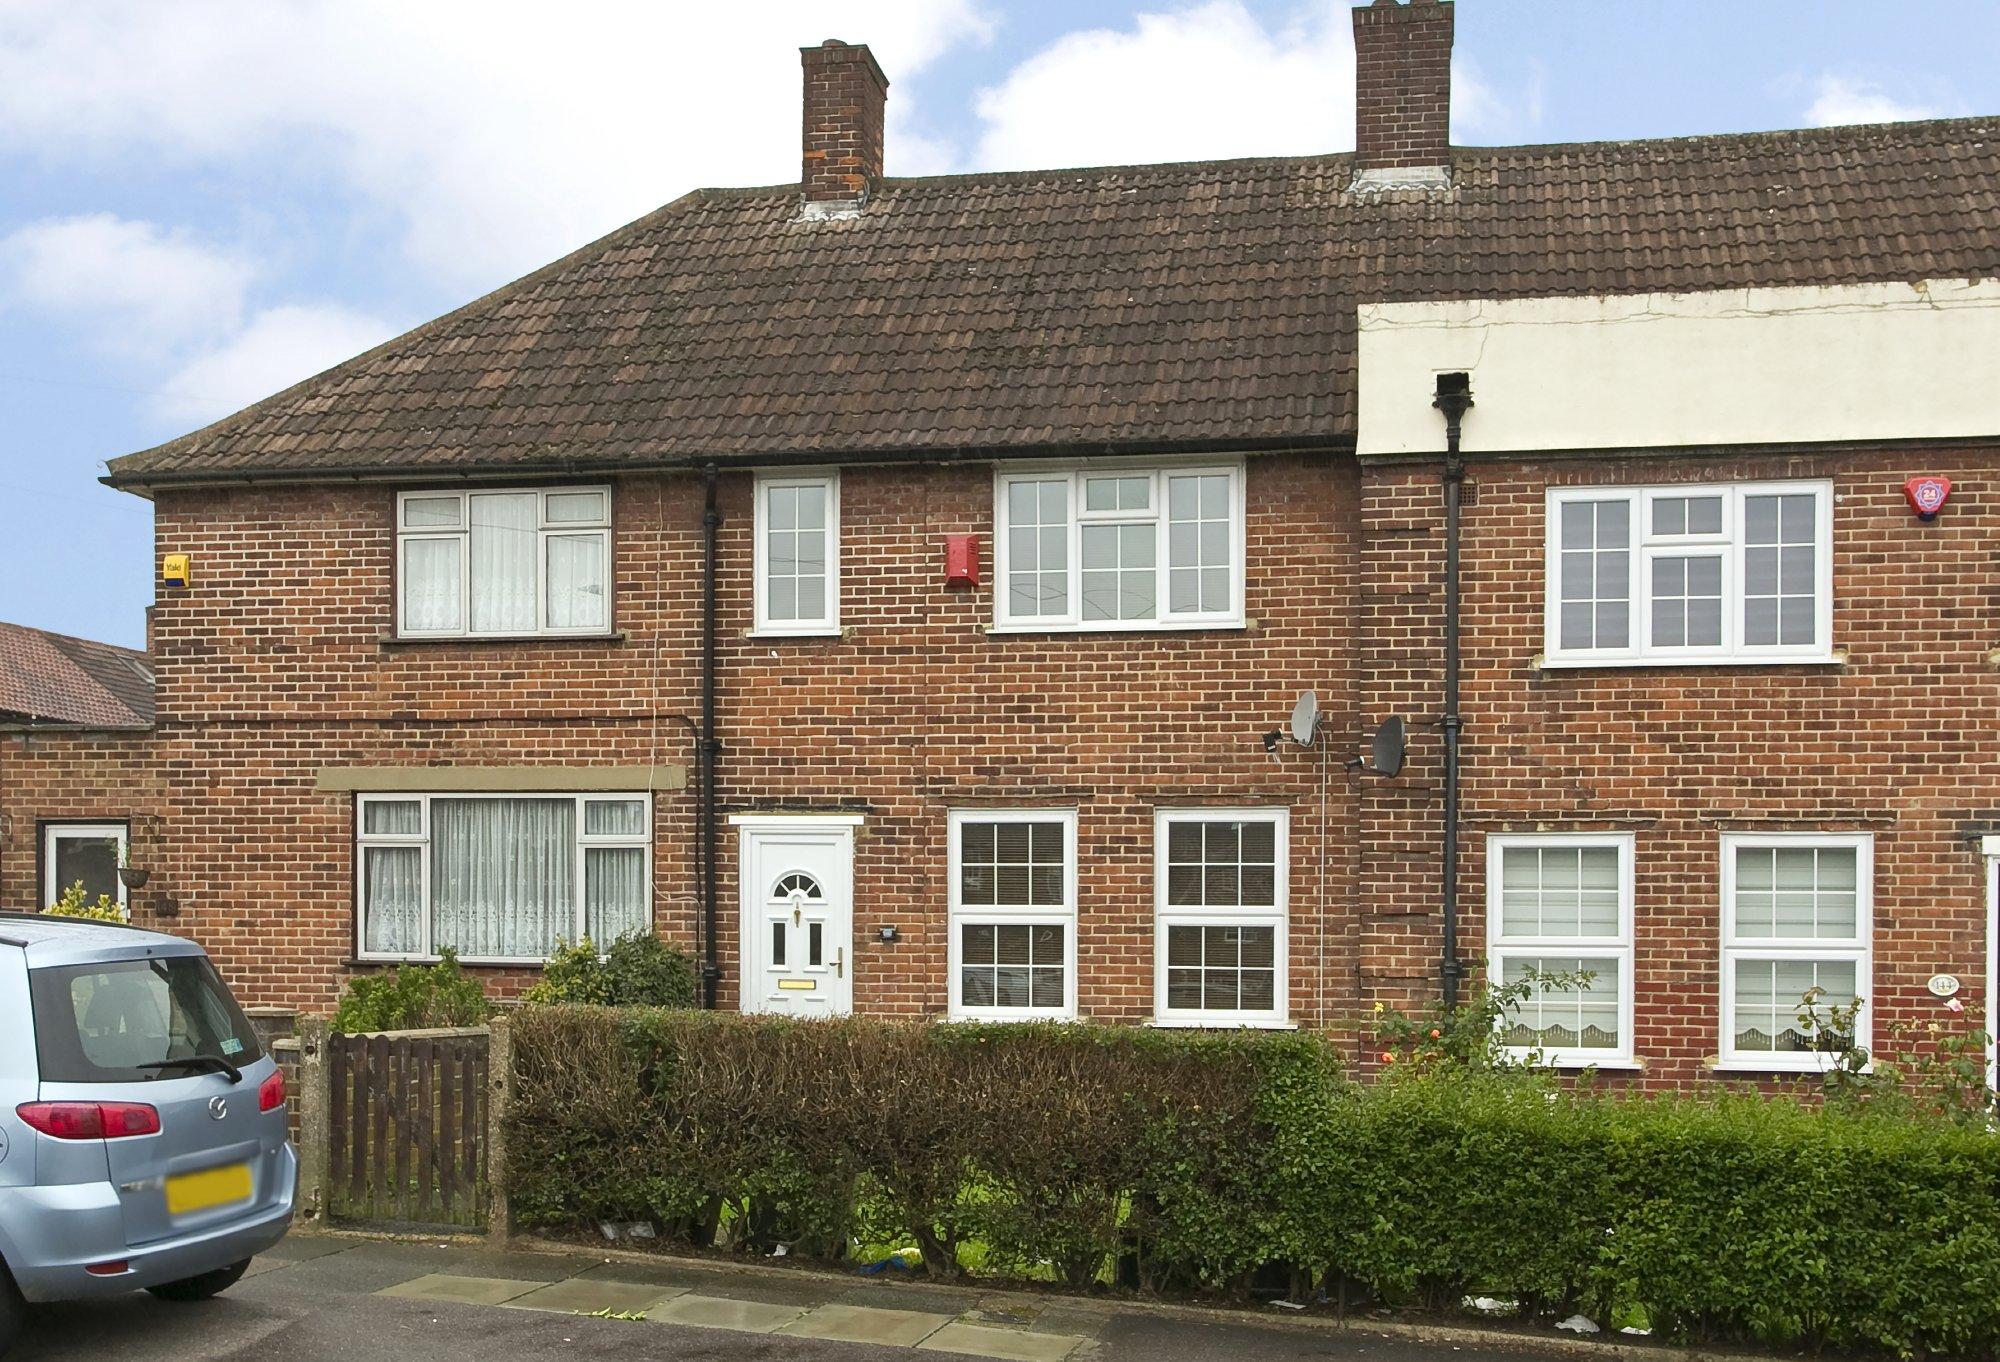 Beaconsfield Road, Mottingham